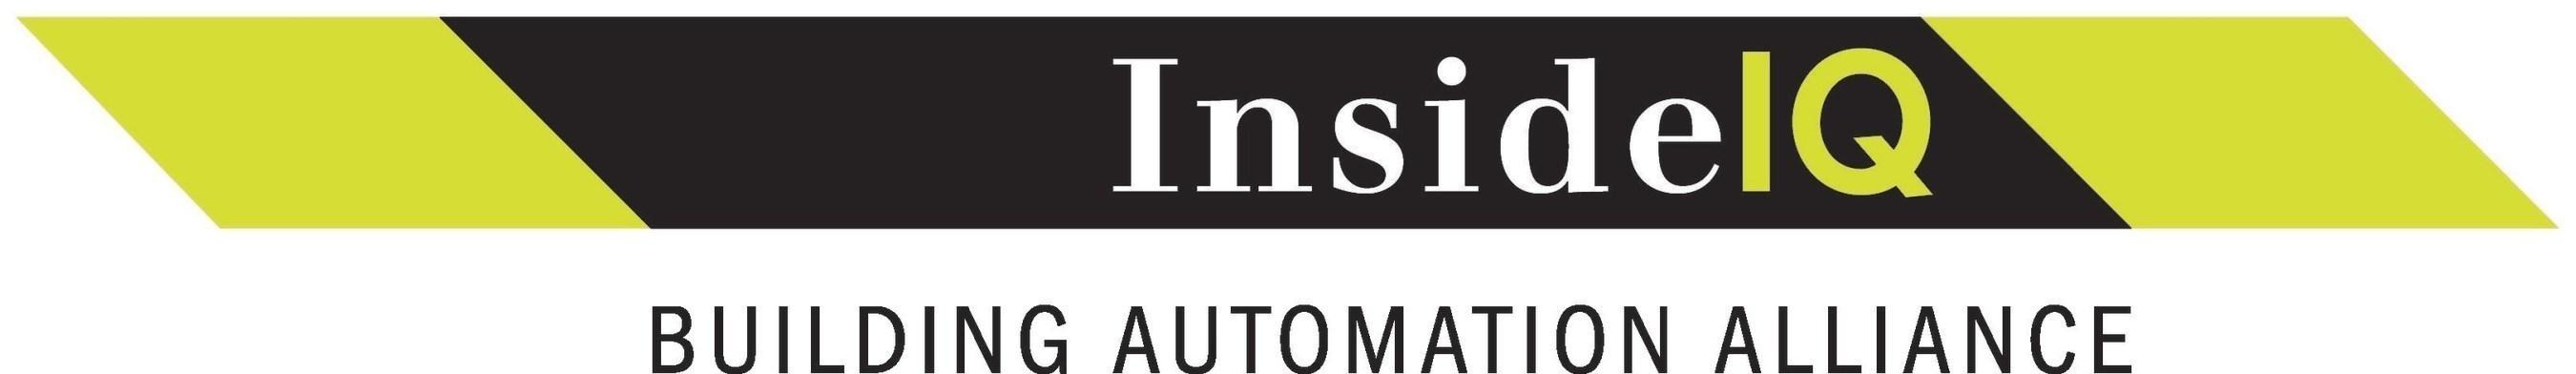 InsideIQ Building Automation Alliance Logo